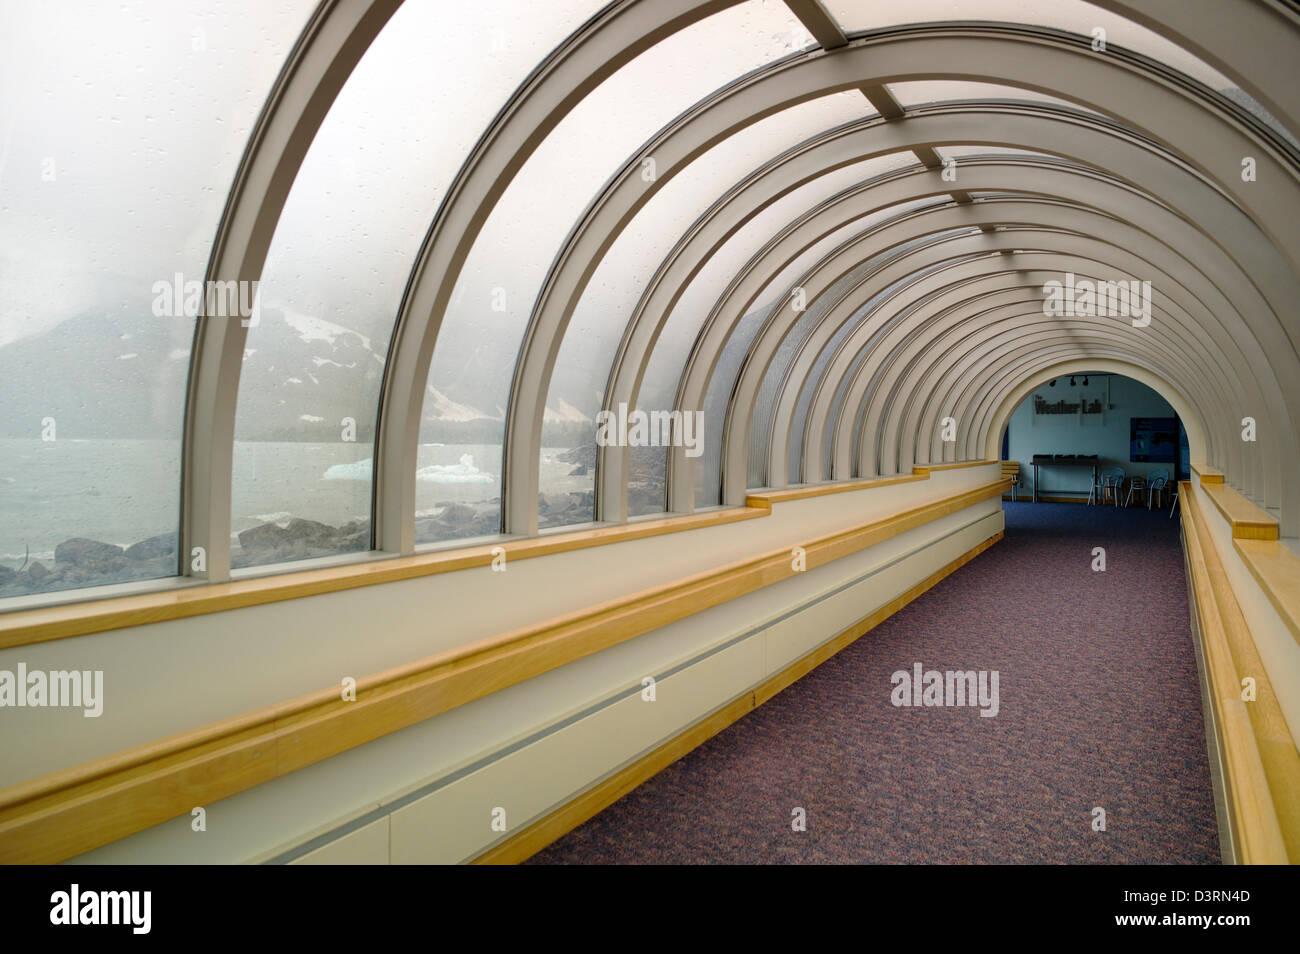 Boggs Visitor Center, Portage Lake, Portage Glacier, Chugach National Forest, Portage, Alaska, USA - Stock Image